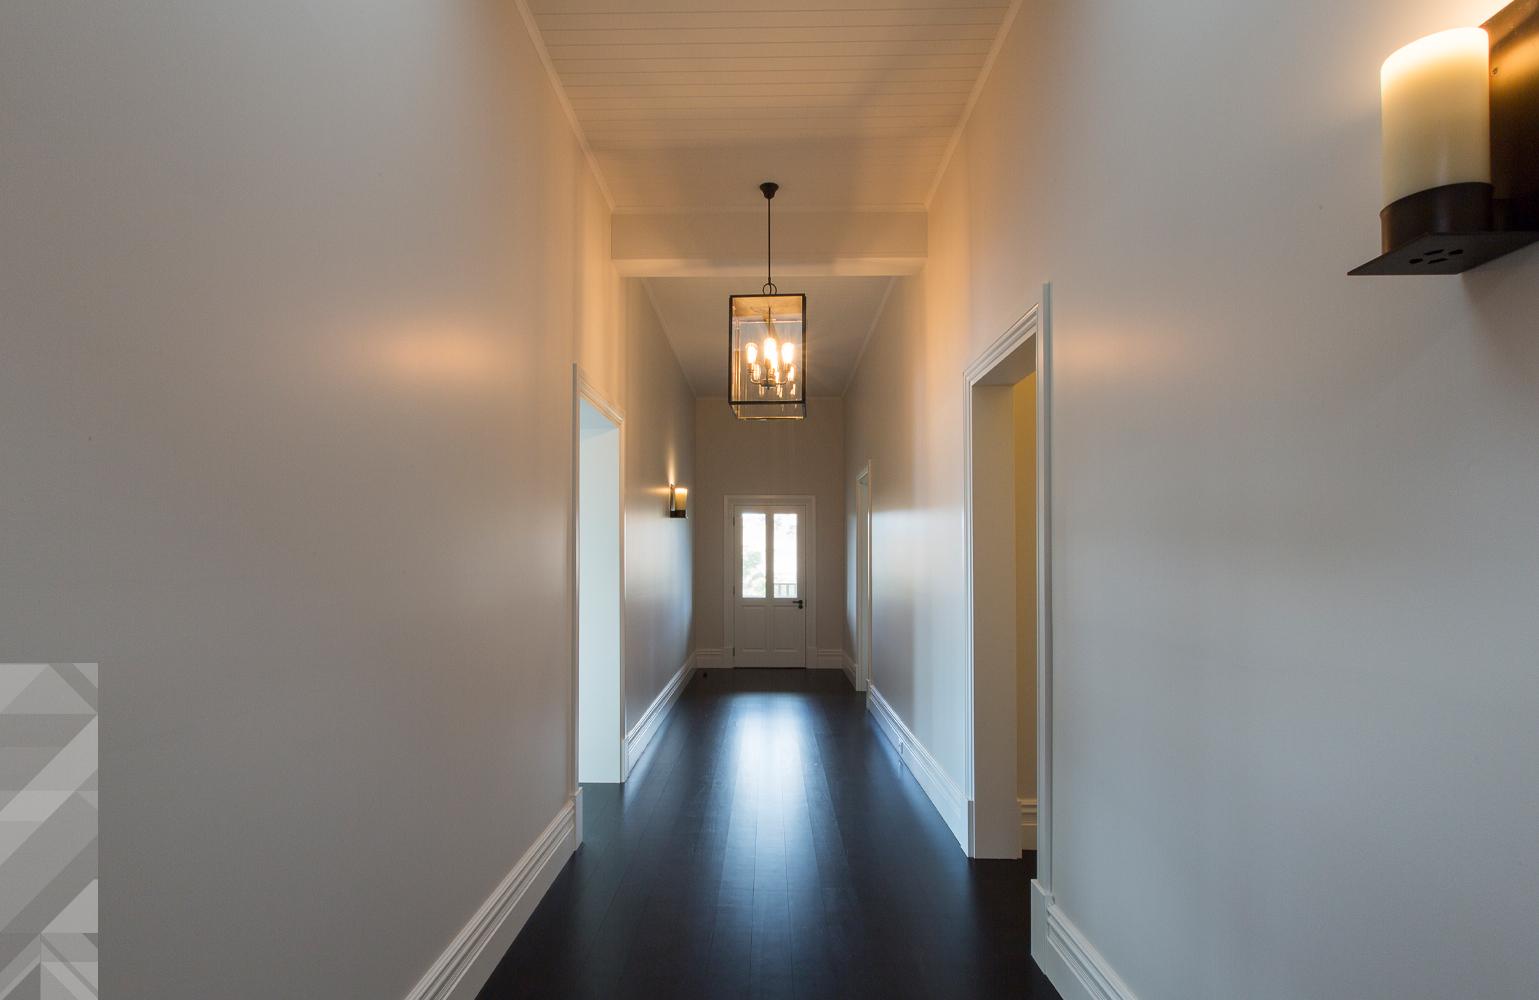 maek-luxury-home-design-inspiration-toodyay-hallway-gallery-8.jpg